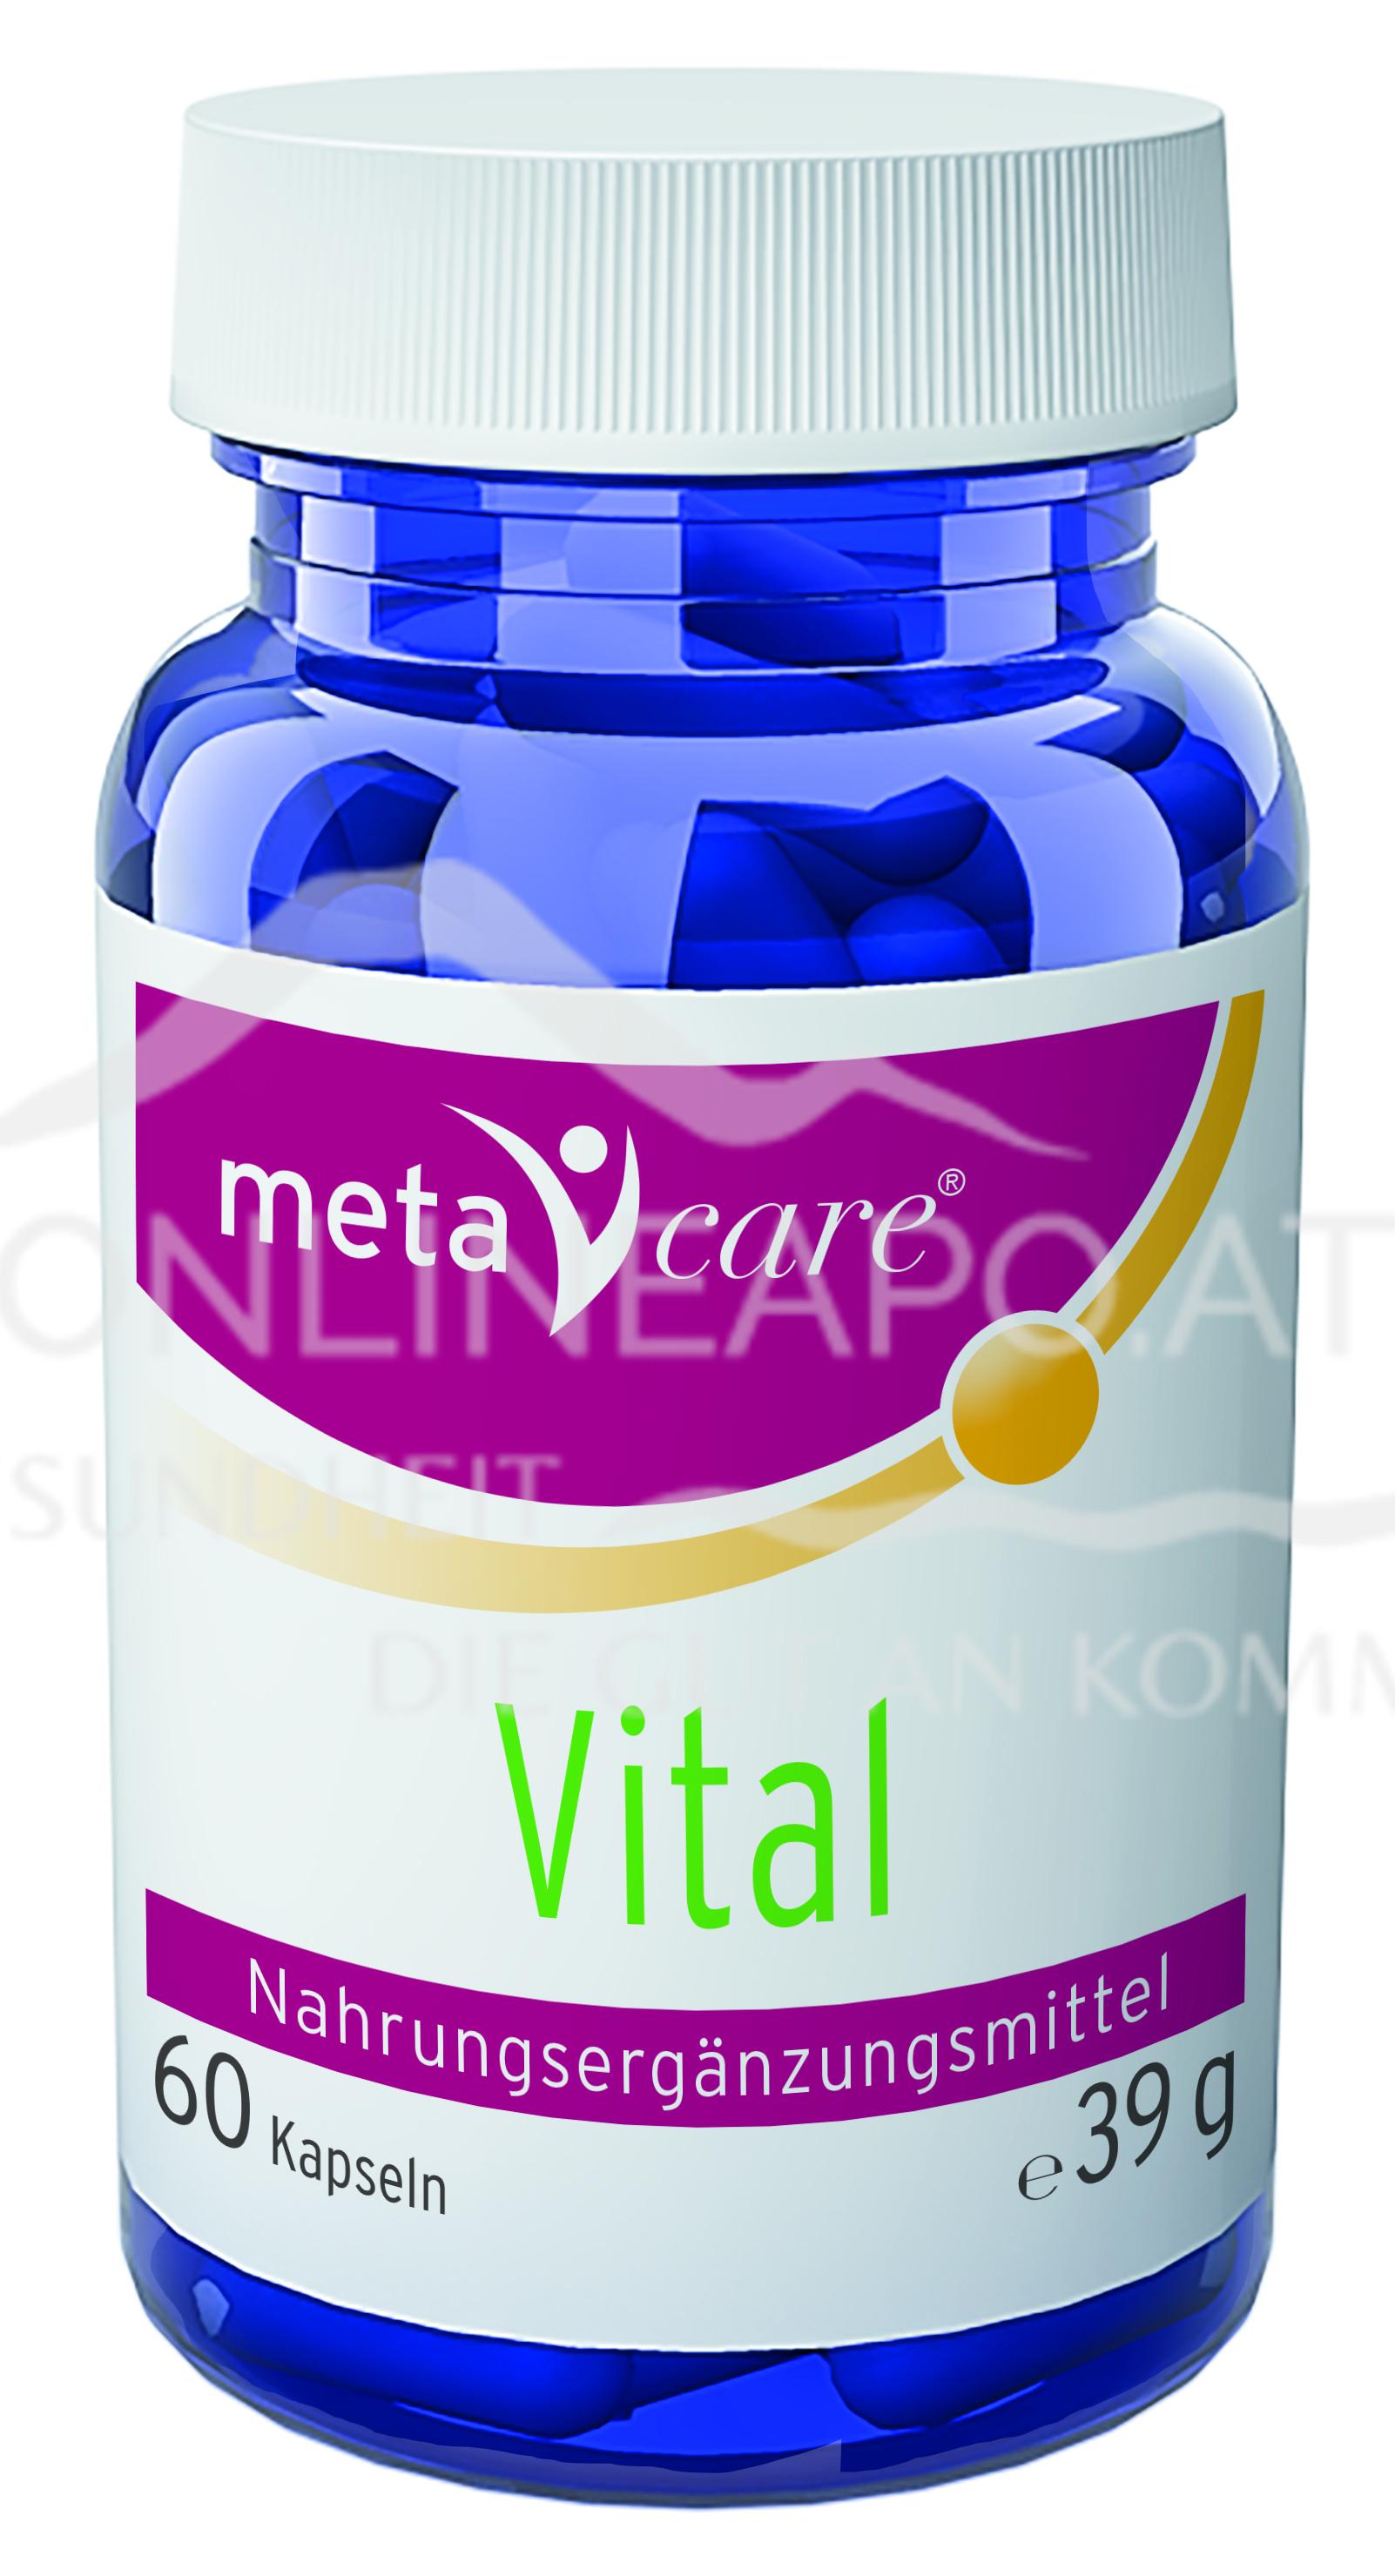 metacare® Vital